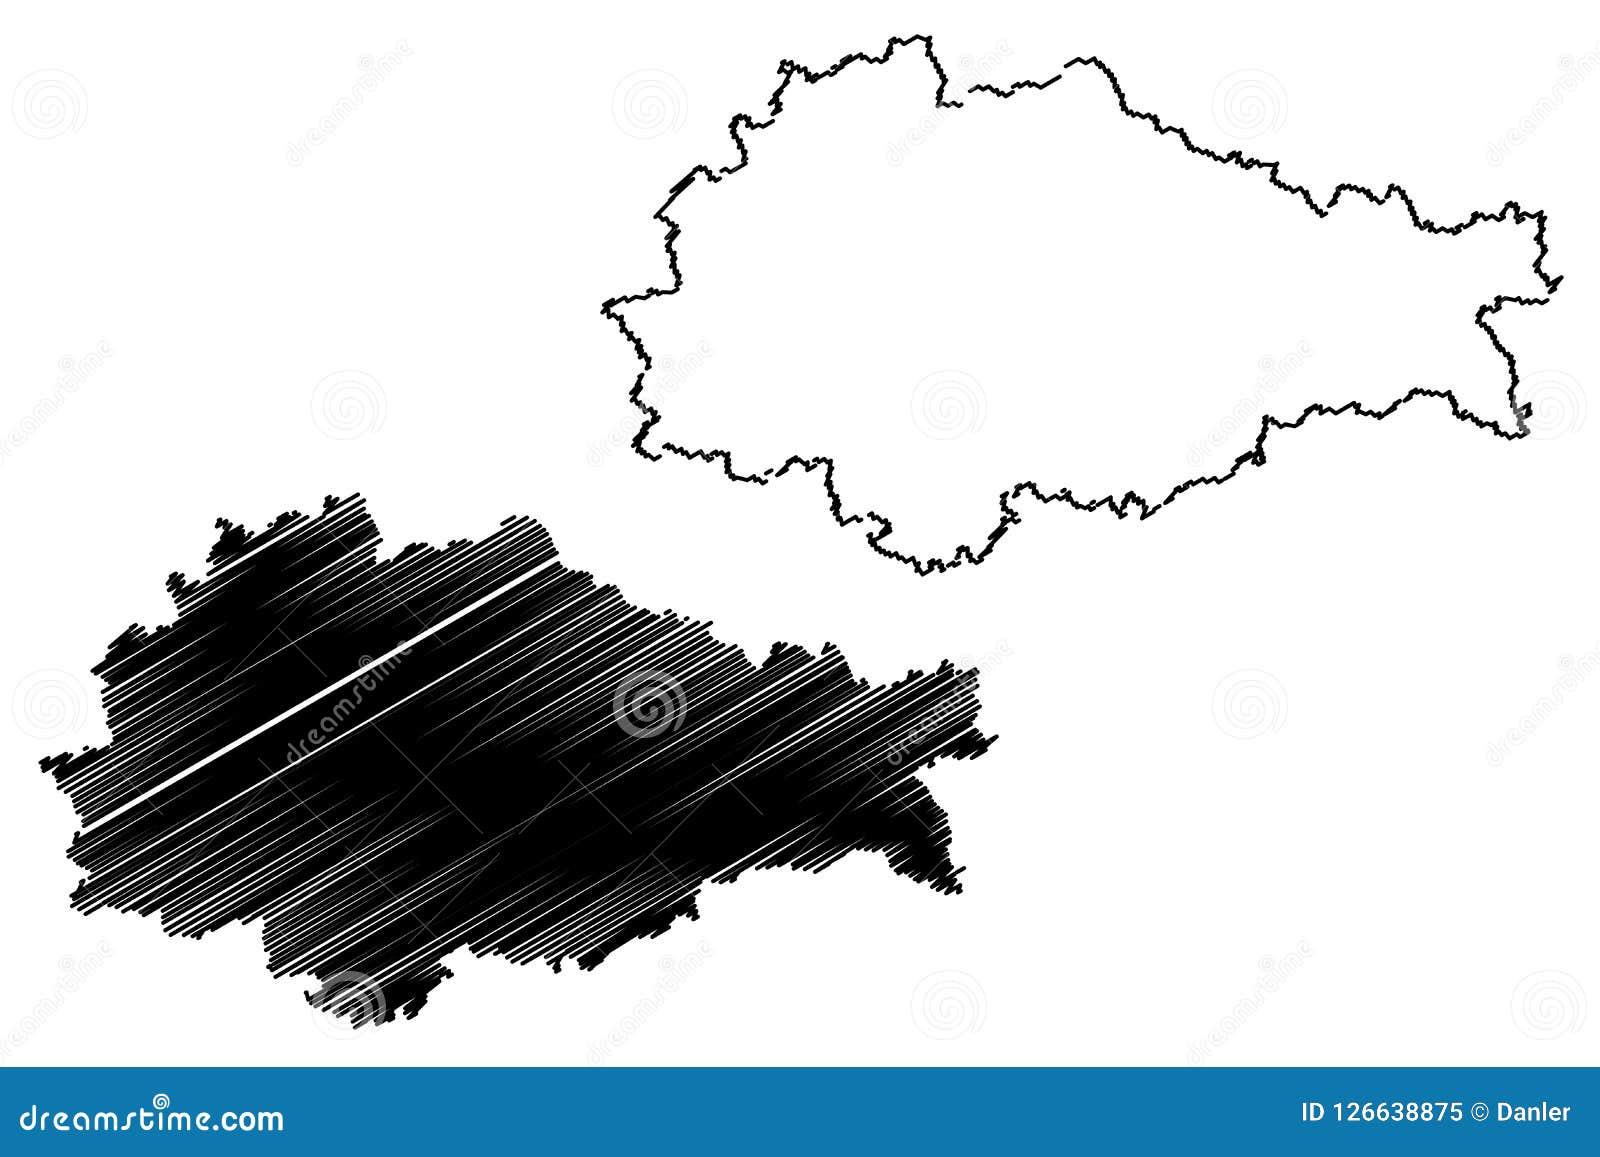 Kursk Oblast map vector stock vector. Illustration of illustration on lyubertsy russia map, markovo russia map, tallinn russia map, tula russia map, tikhvin russia map, war russia map, elista russia map, zagorsk russia map, sevastopol russia map, severomorsk russia map, stalingrad russia map, krasnogorsk russia map, ivanovo russia map, nyagan russia map, kirovsk russia map, yurga russia map, kalmykia russia map, donetsk russia map, birobidzhan russia map, ukhta russia map,